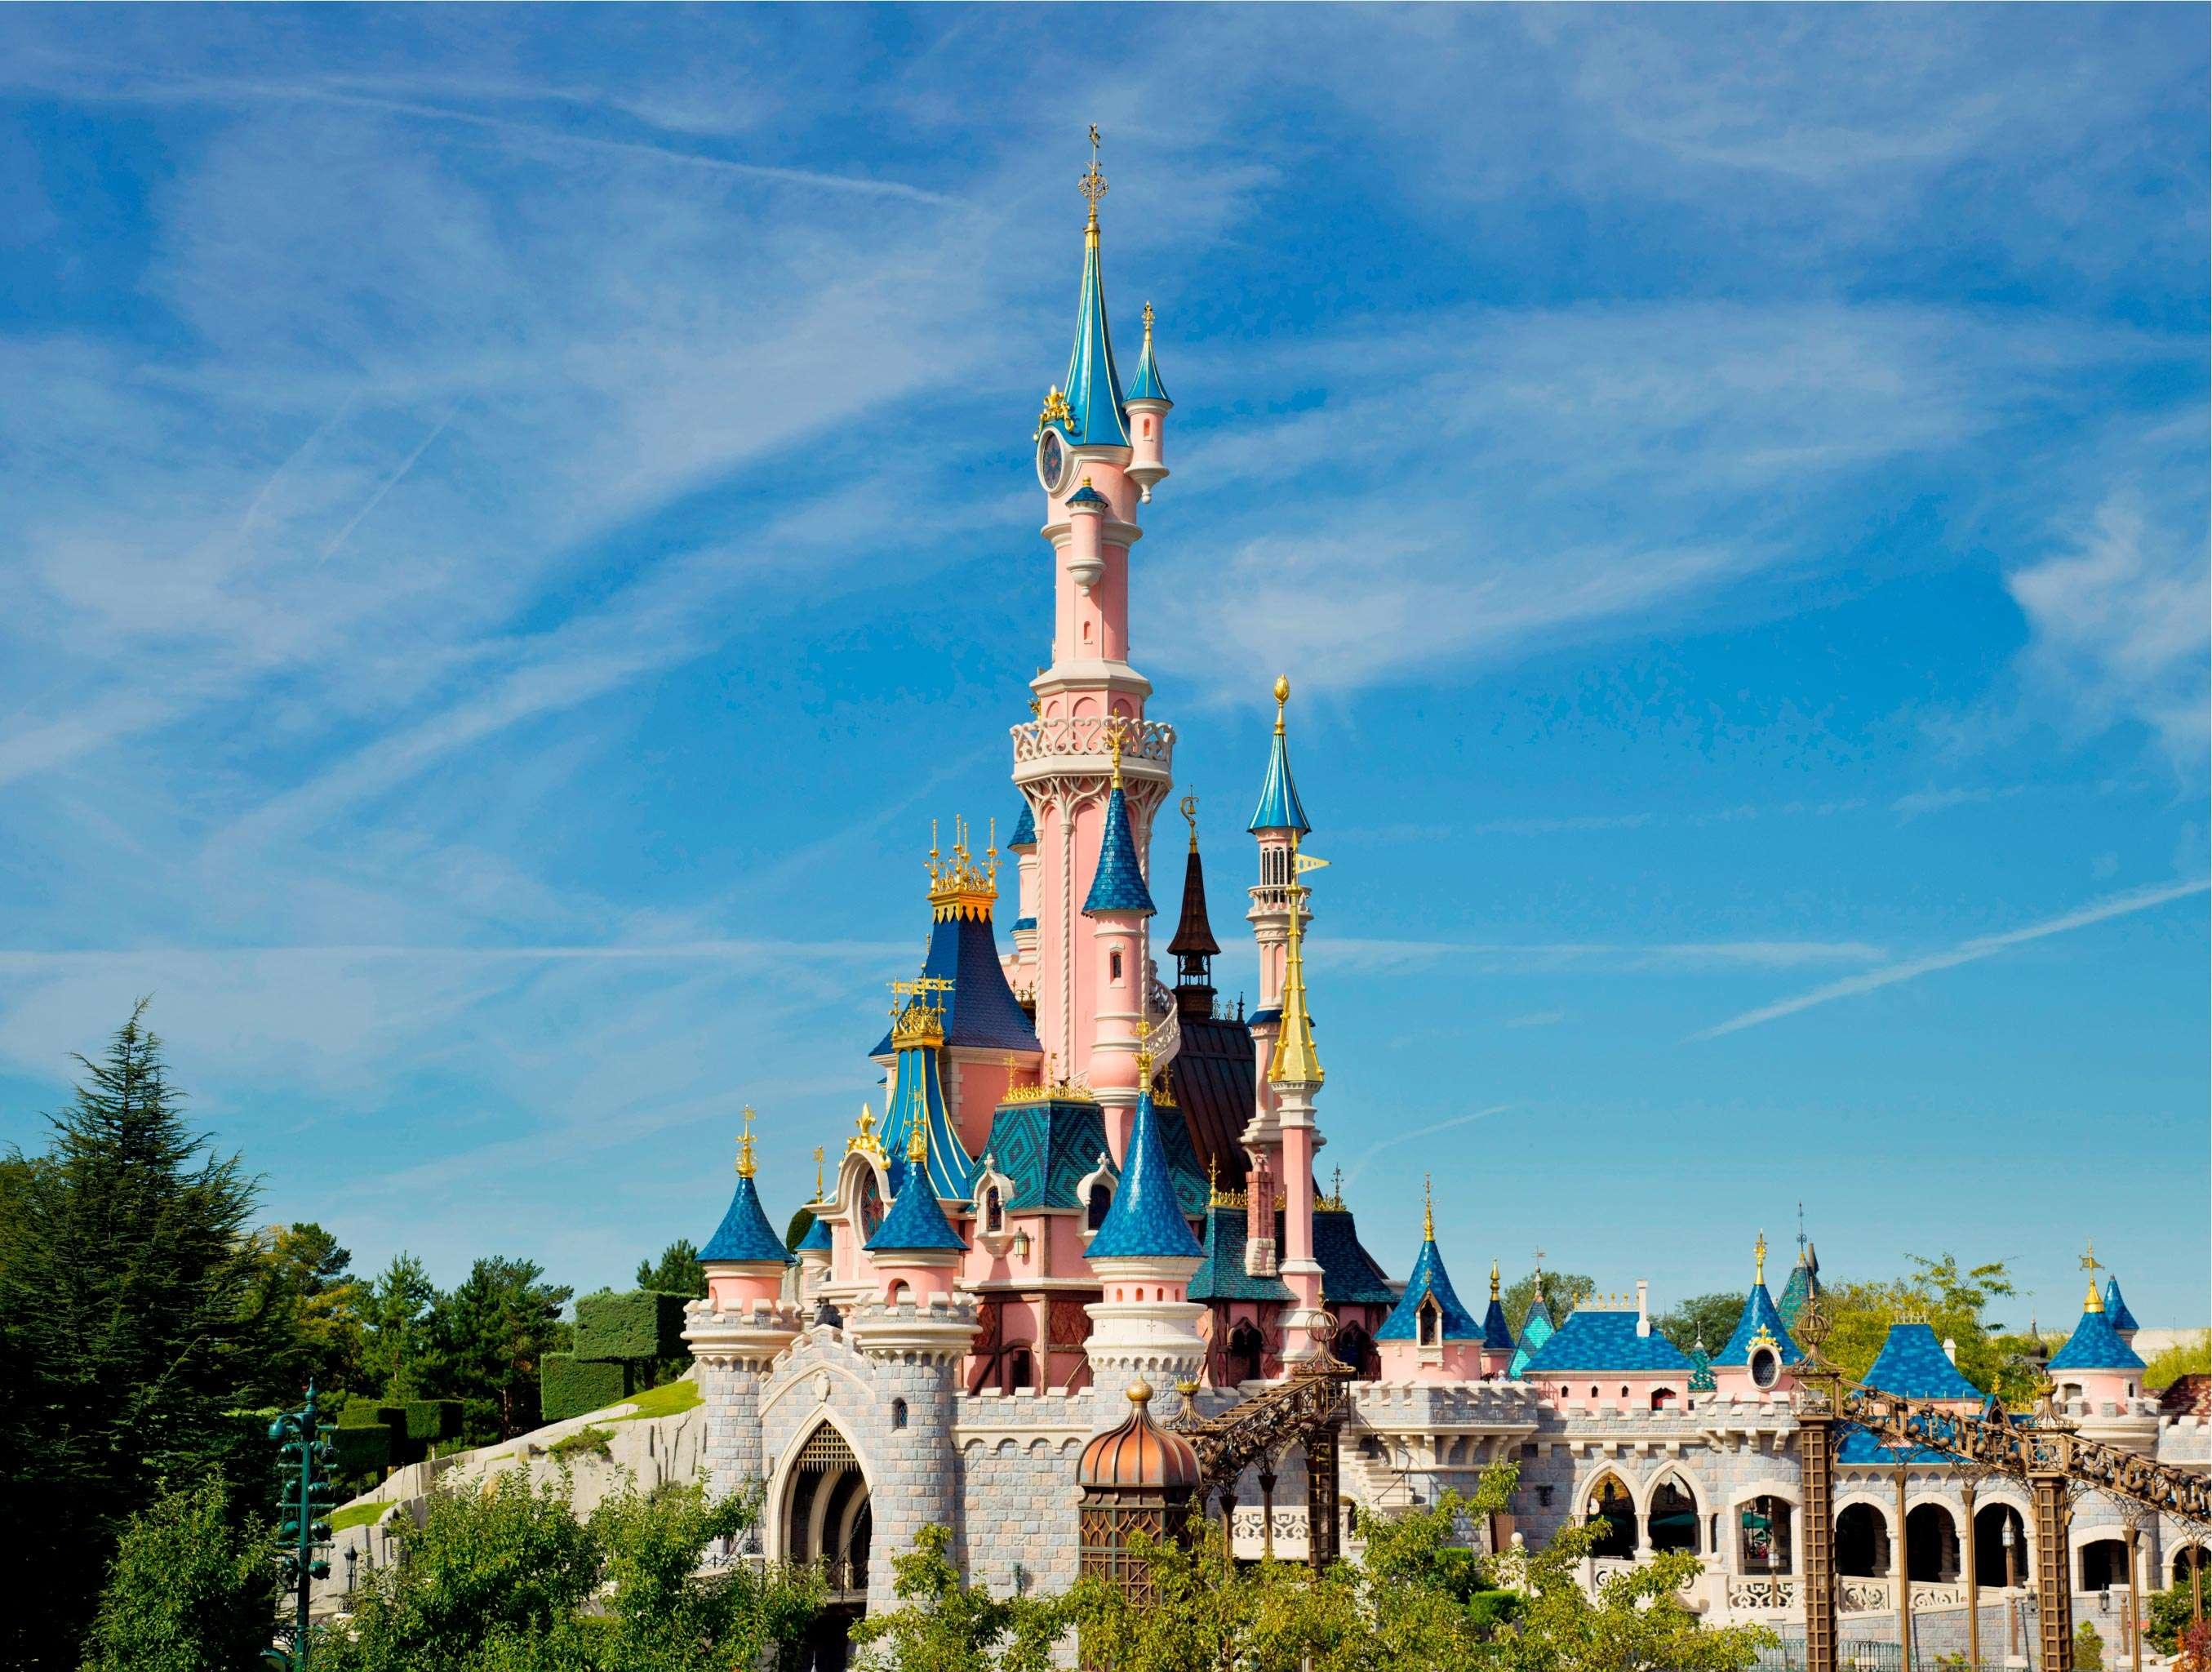 Khám phá Disneyland Paris